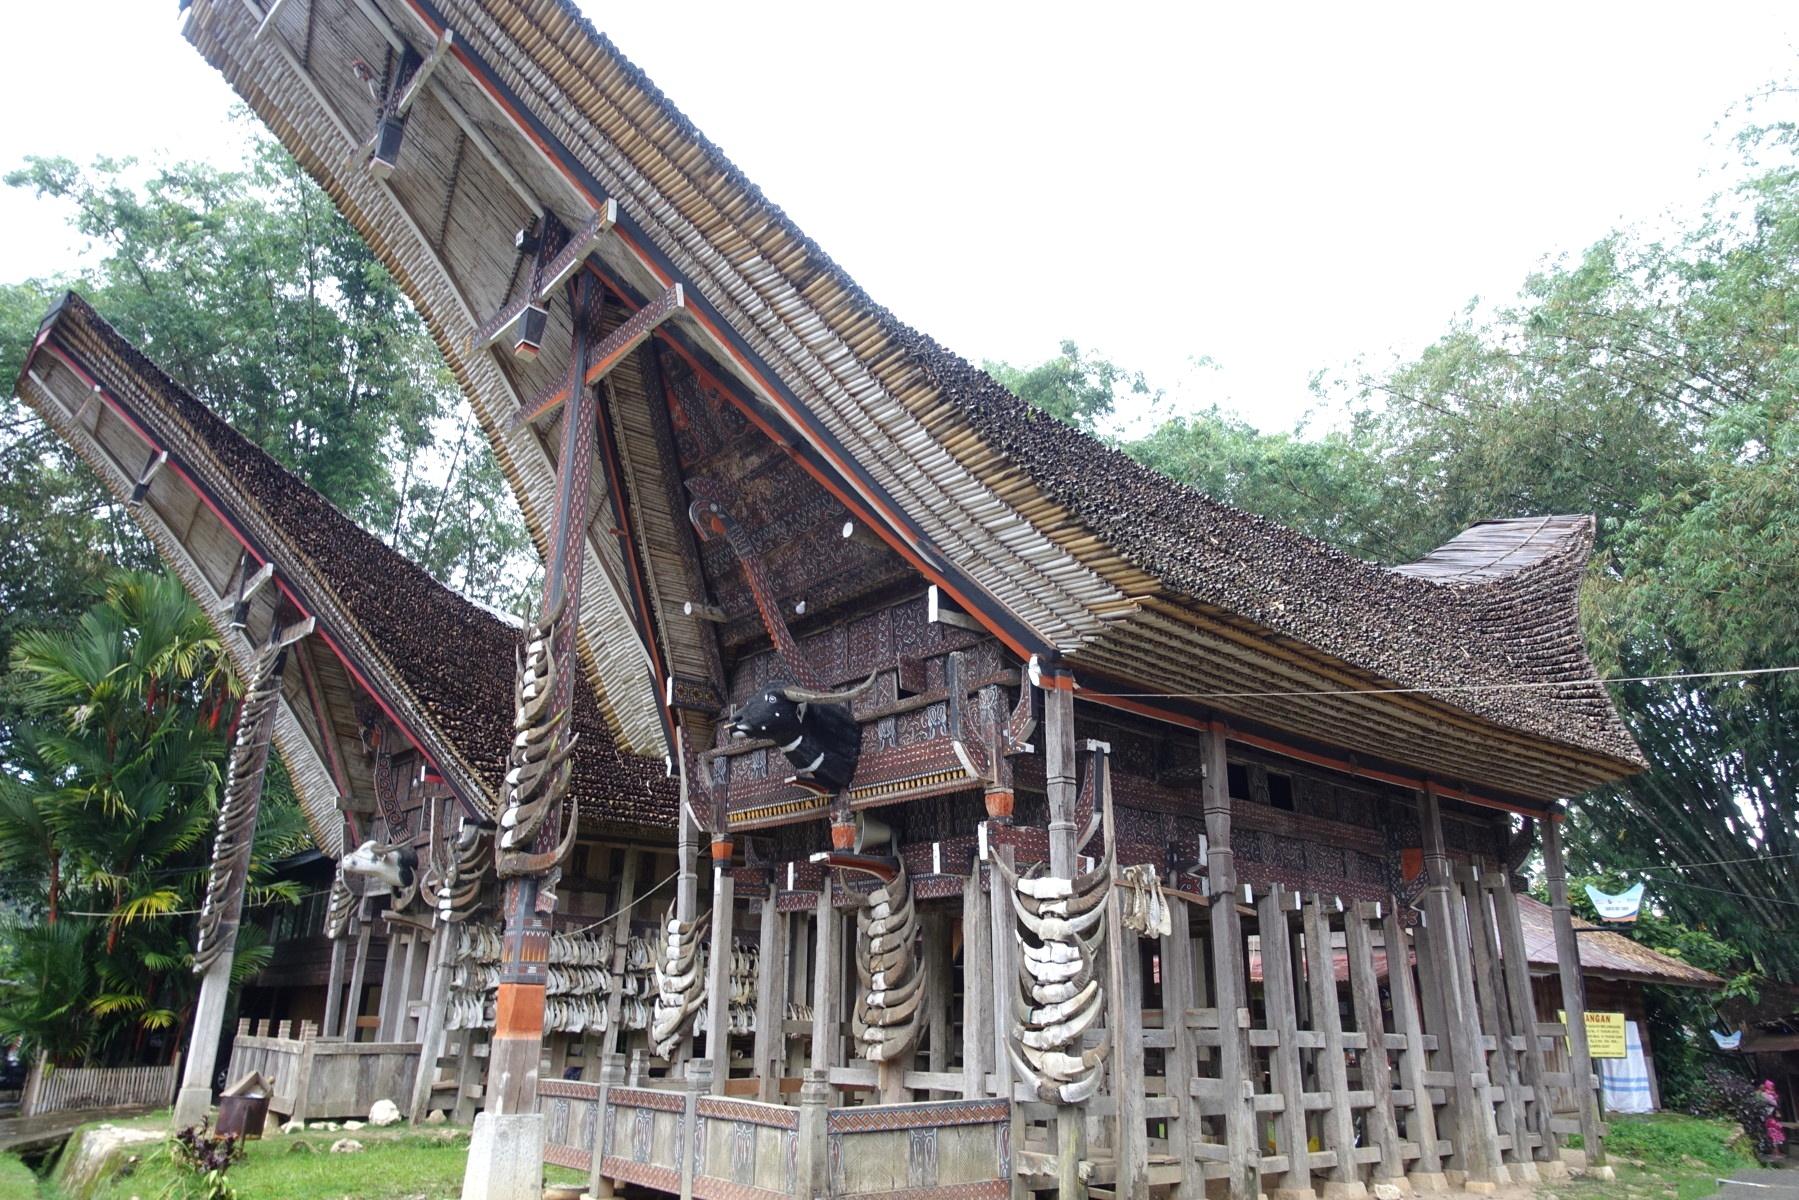 Indonesie_Sulawesi_Toraja_Rantepao DSC05162